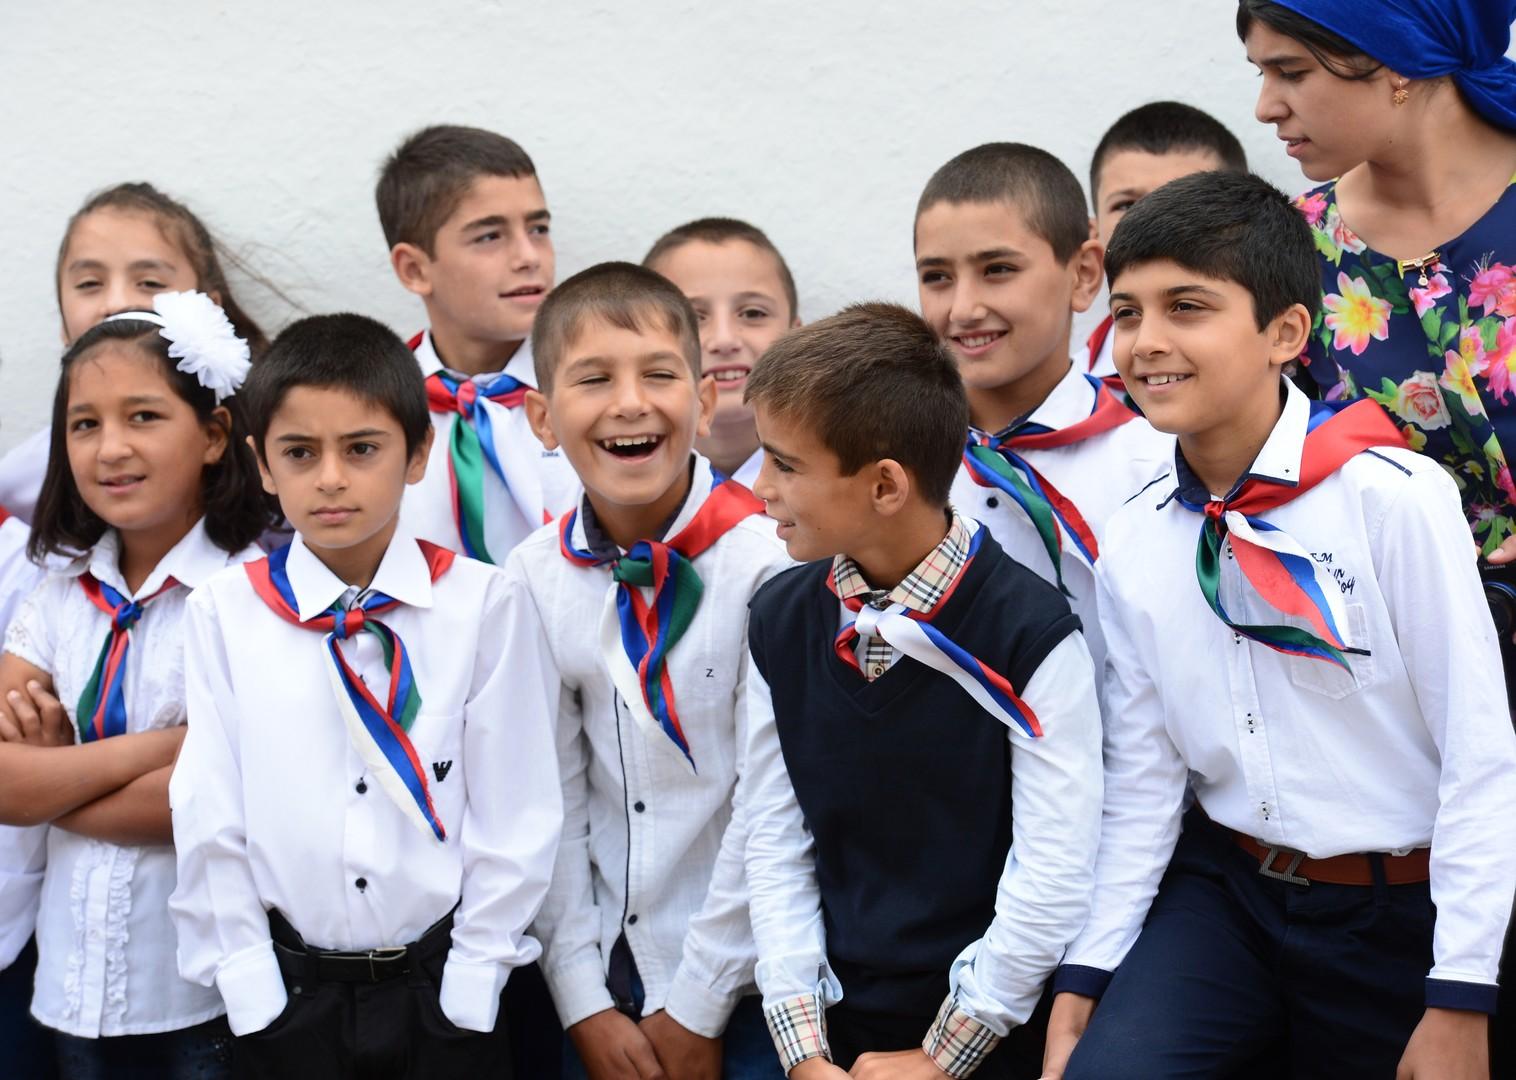 Schüler im Dorf Werchni Dschalgan in Dagestan